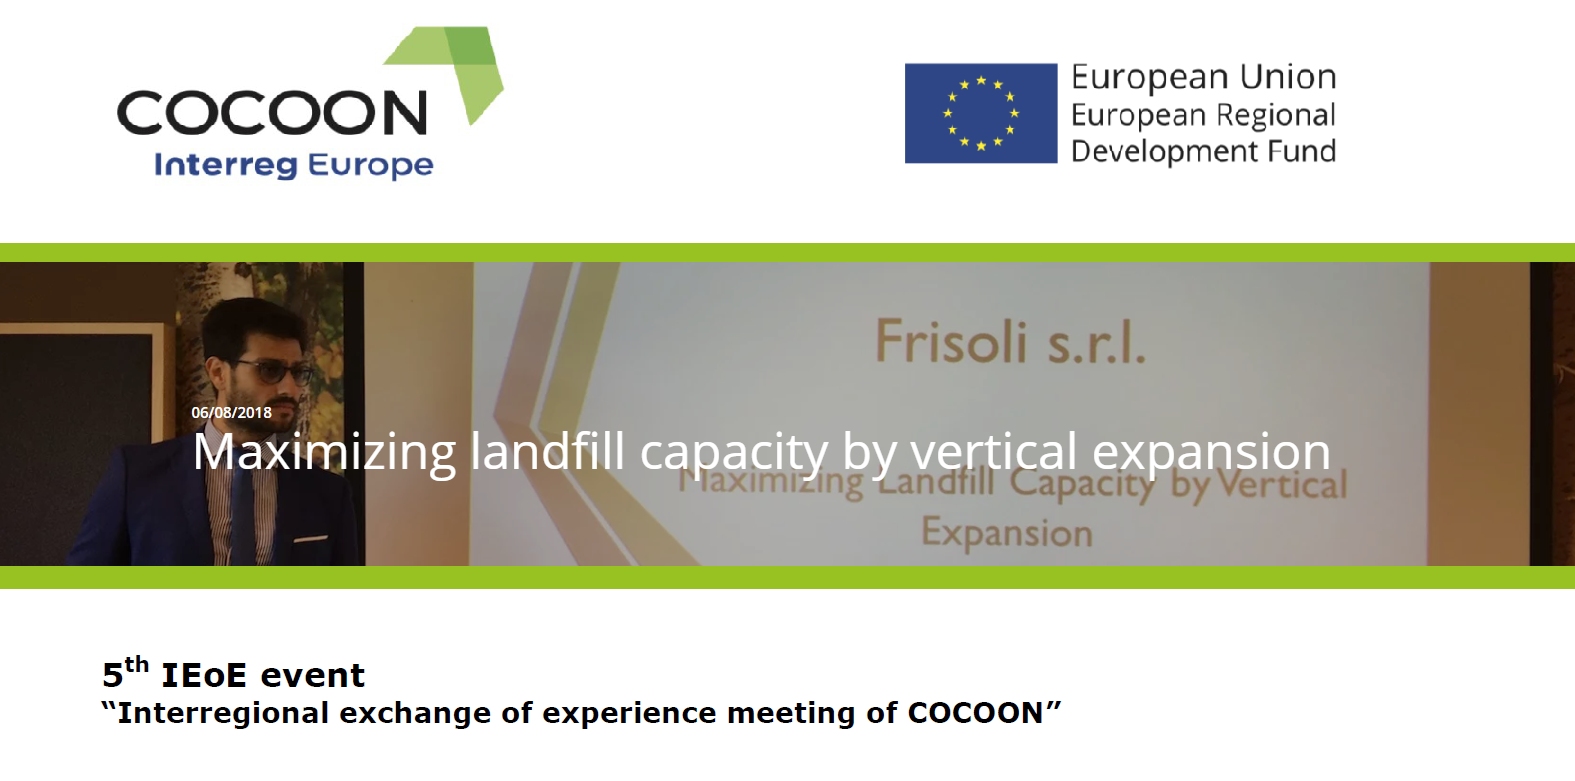 Interregional exchange of experience meeting